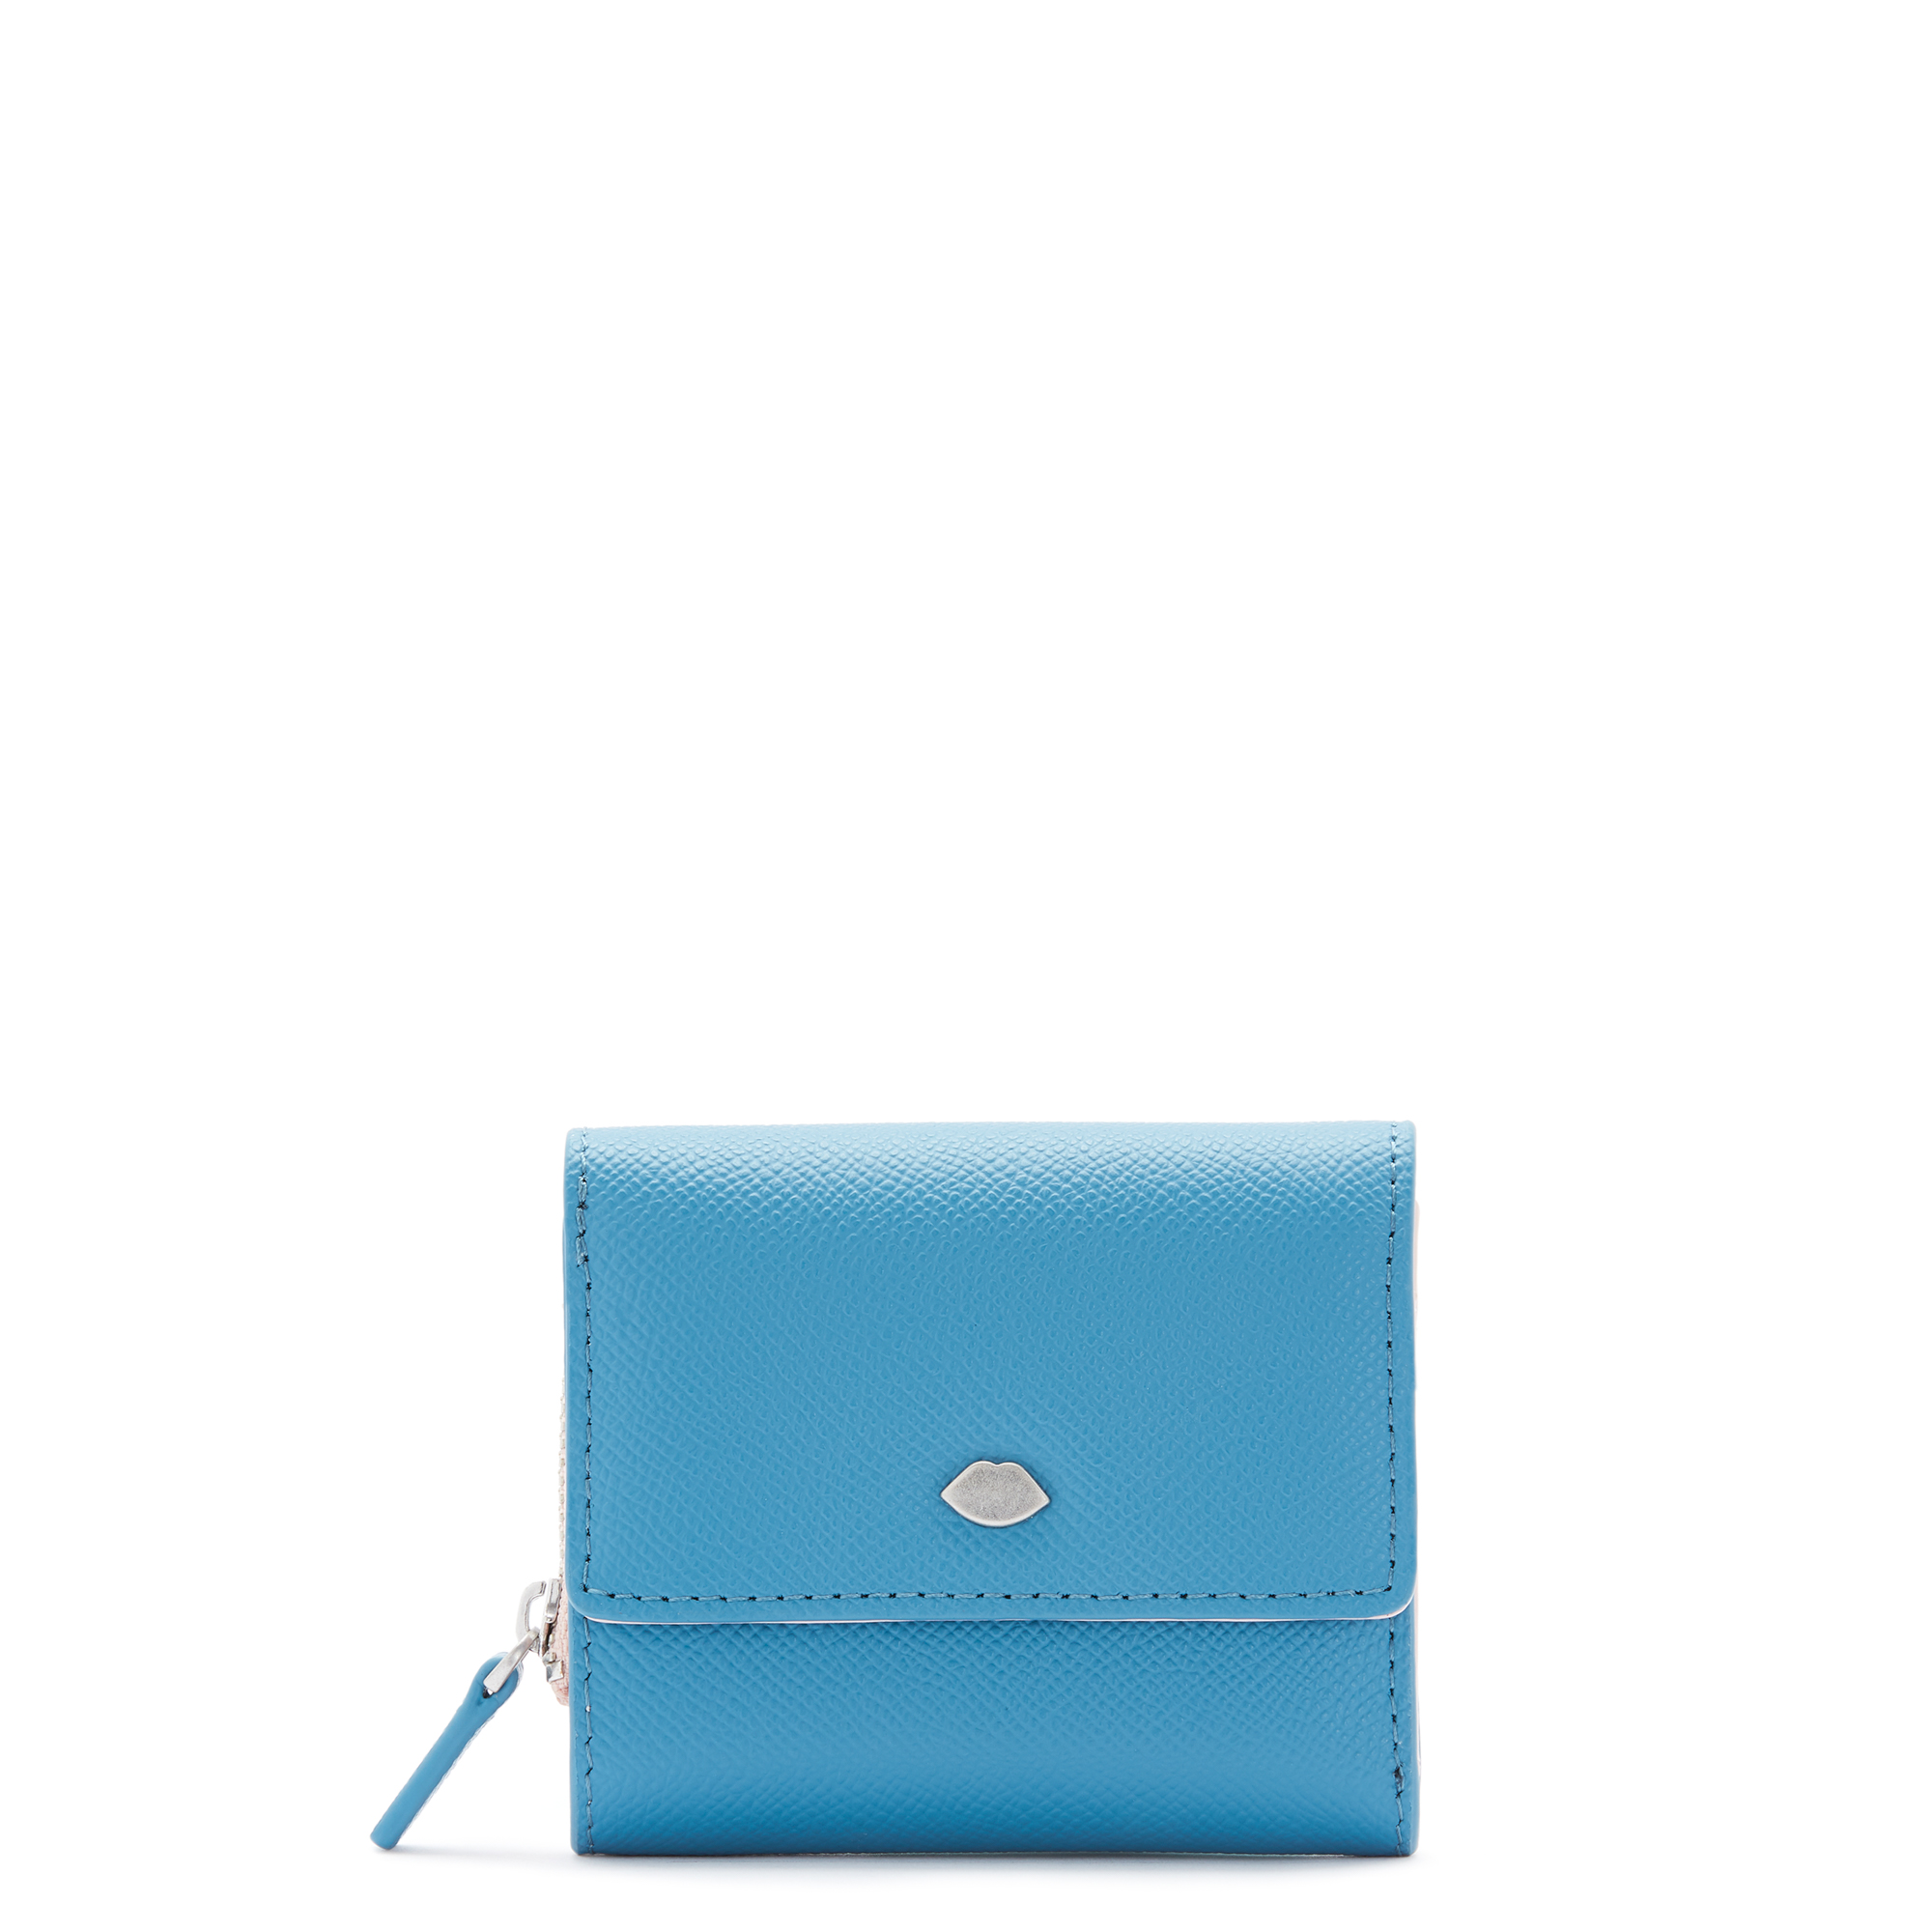 Sailor Blue Leather Lip Pin Jodie Wallet